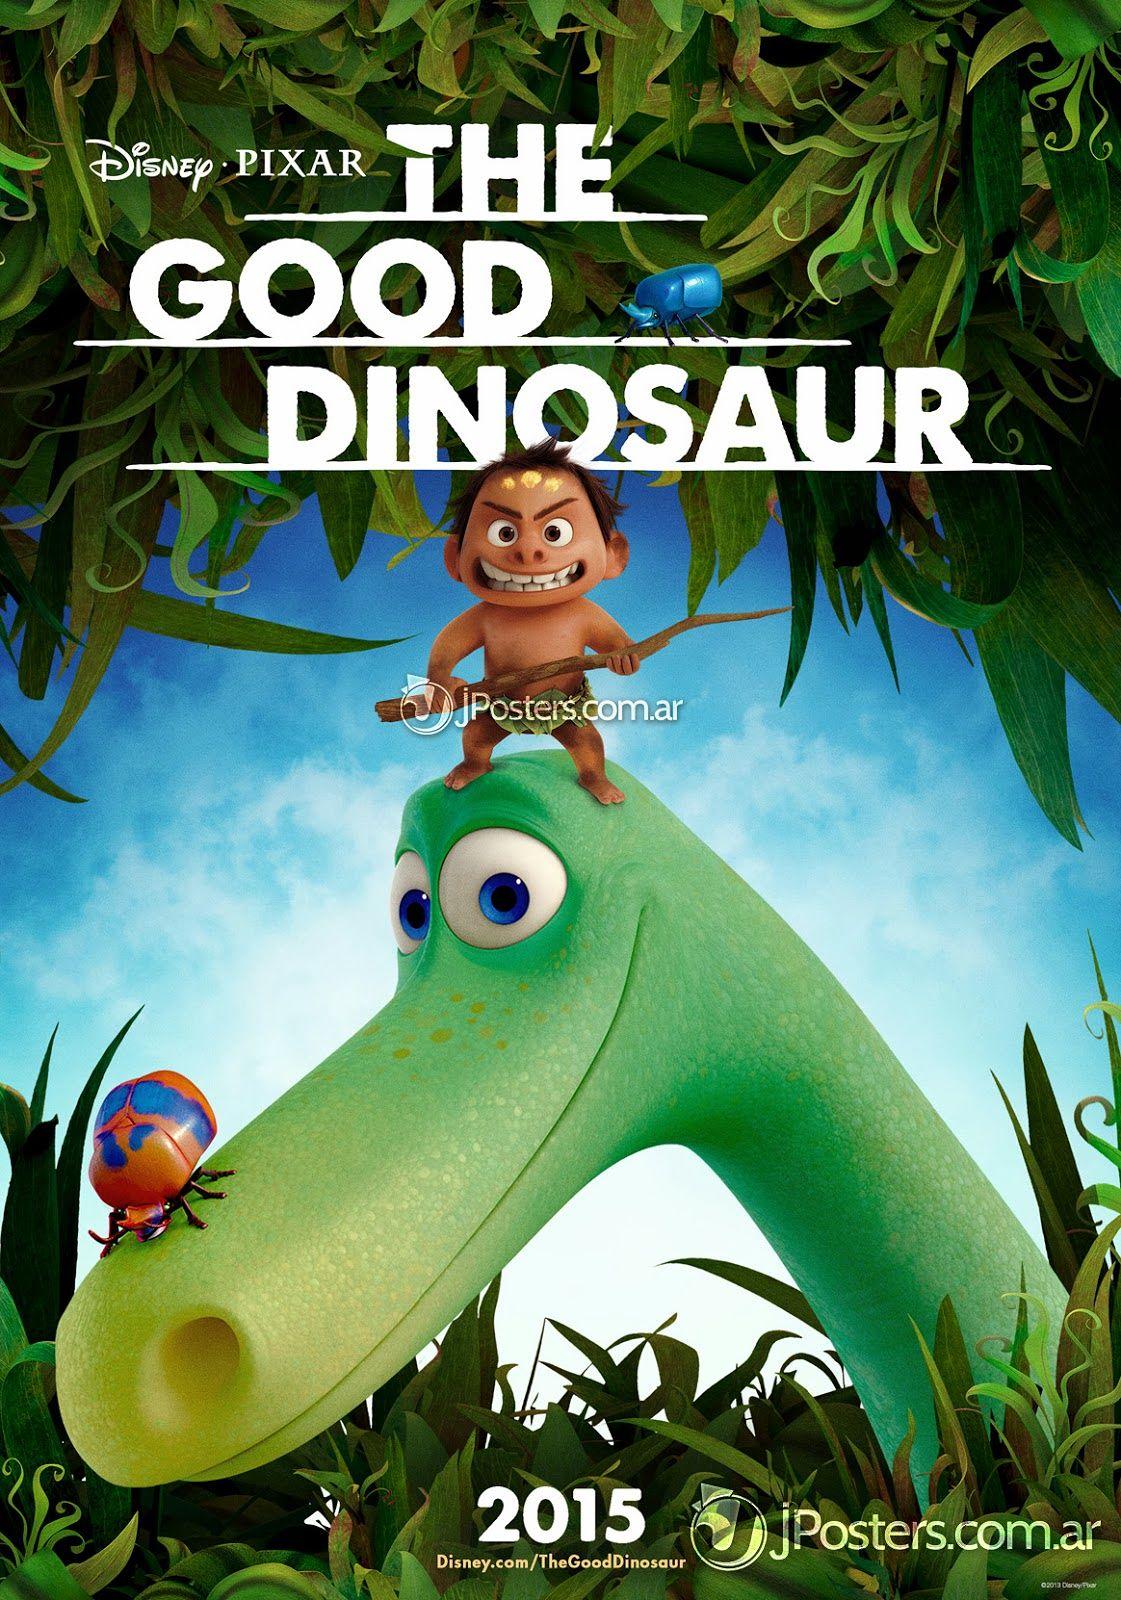 The Good Dinosaur ผจญภัยไดโนเสาร์เพื่อนรัก (2015)